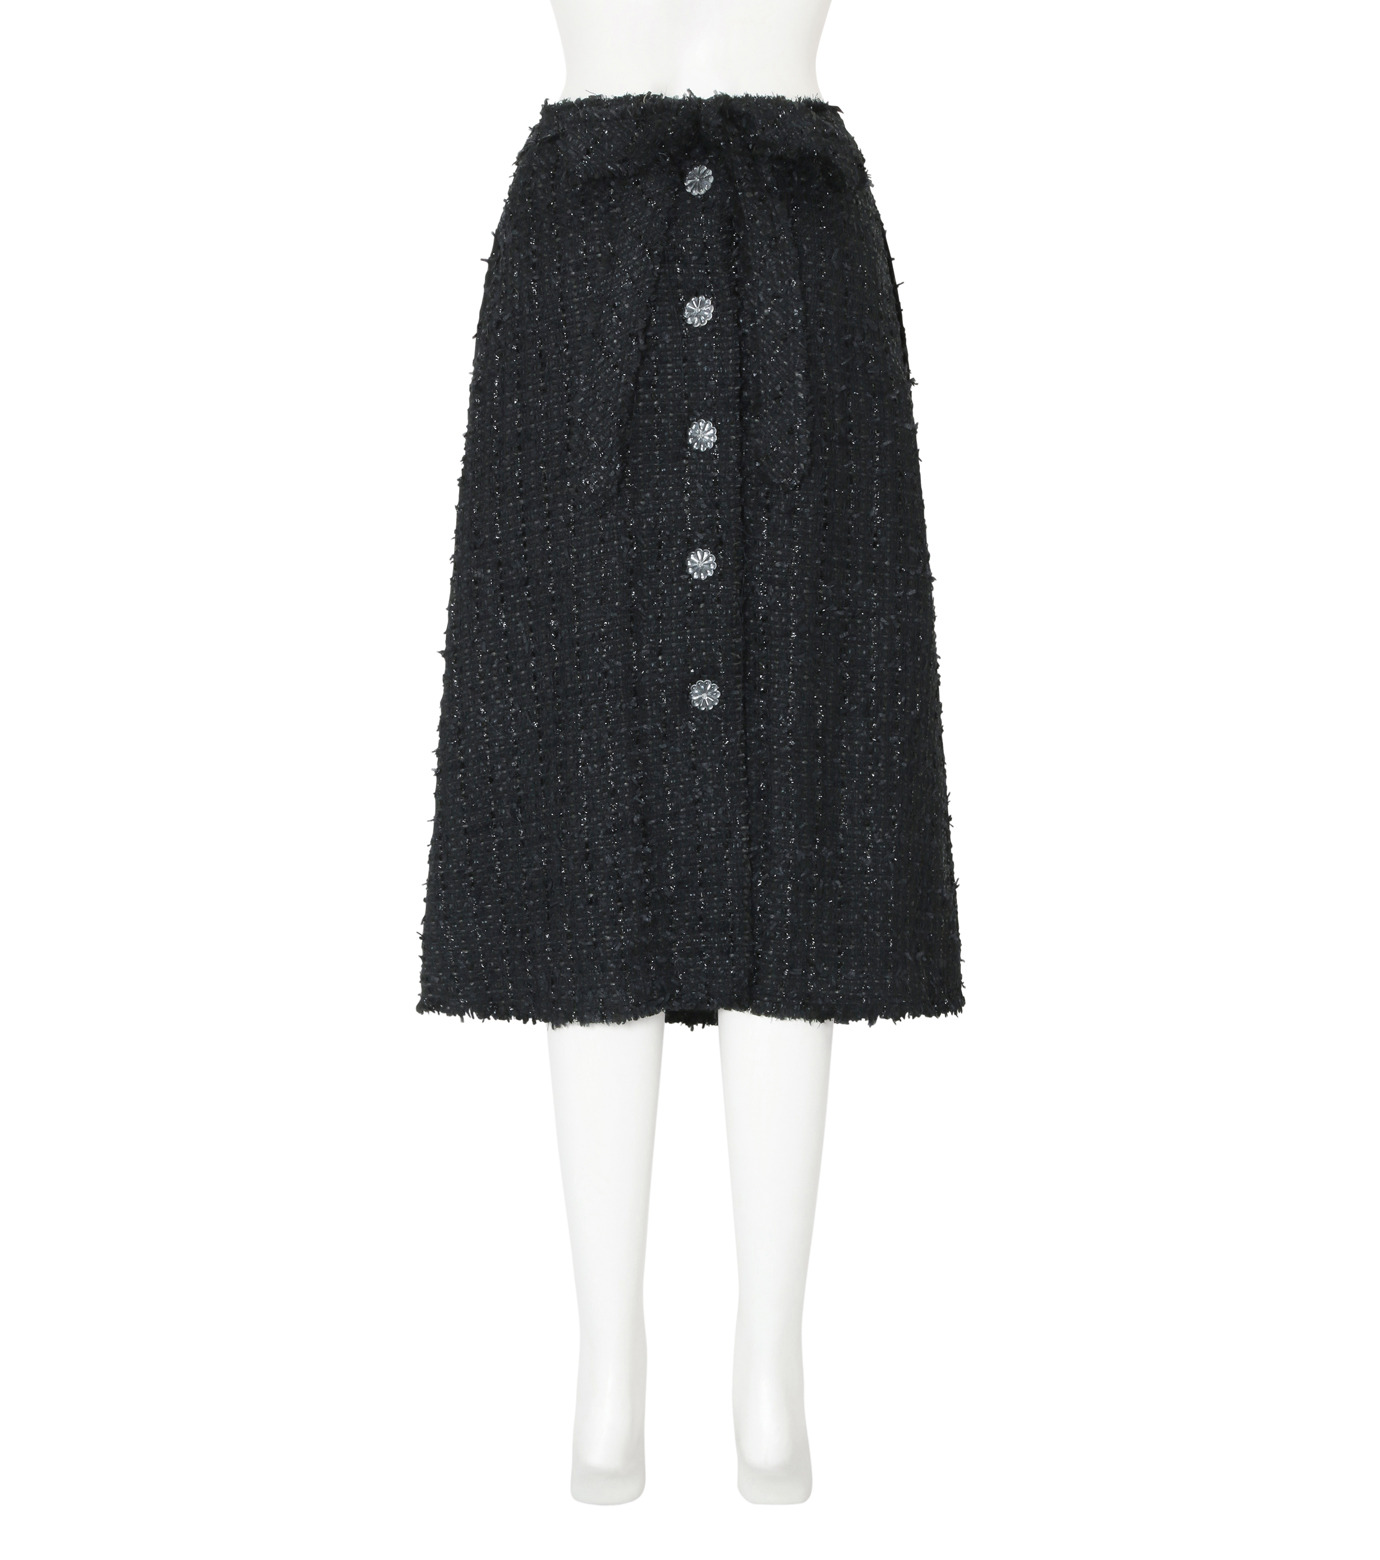 Simone Rocha(シモーネロシャ)のFine Tweed Skirt-BLACK(スカート/skirt)-3359-13 拡大詳細画像2